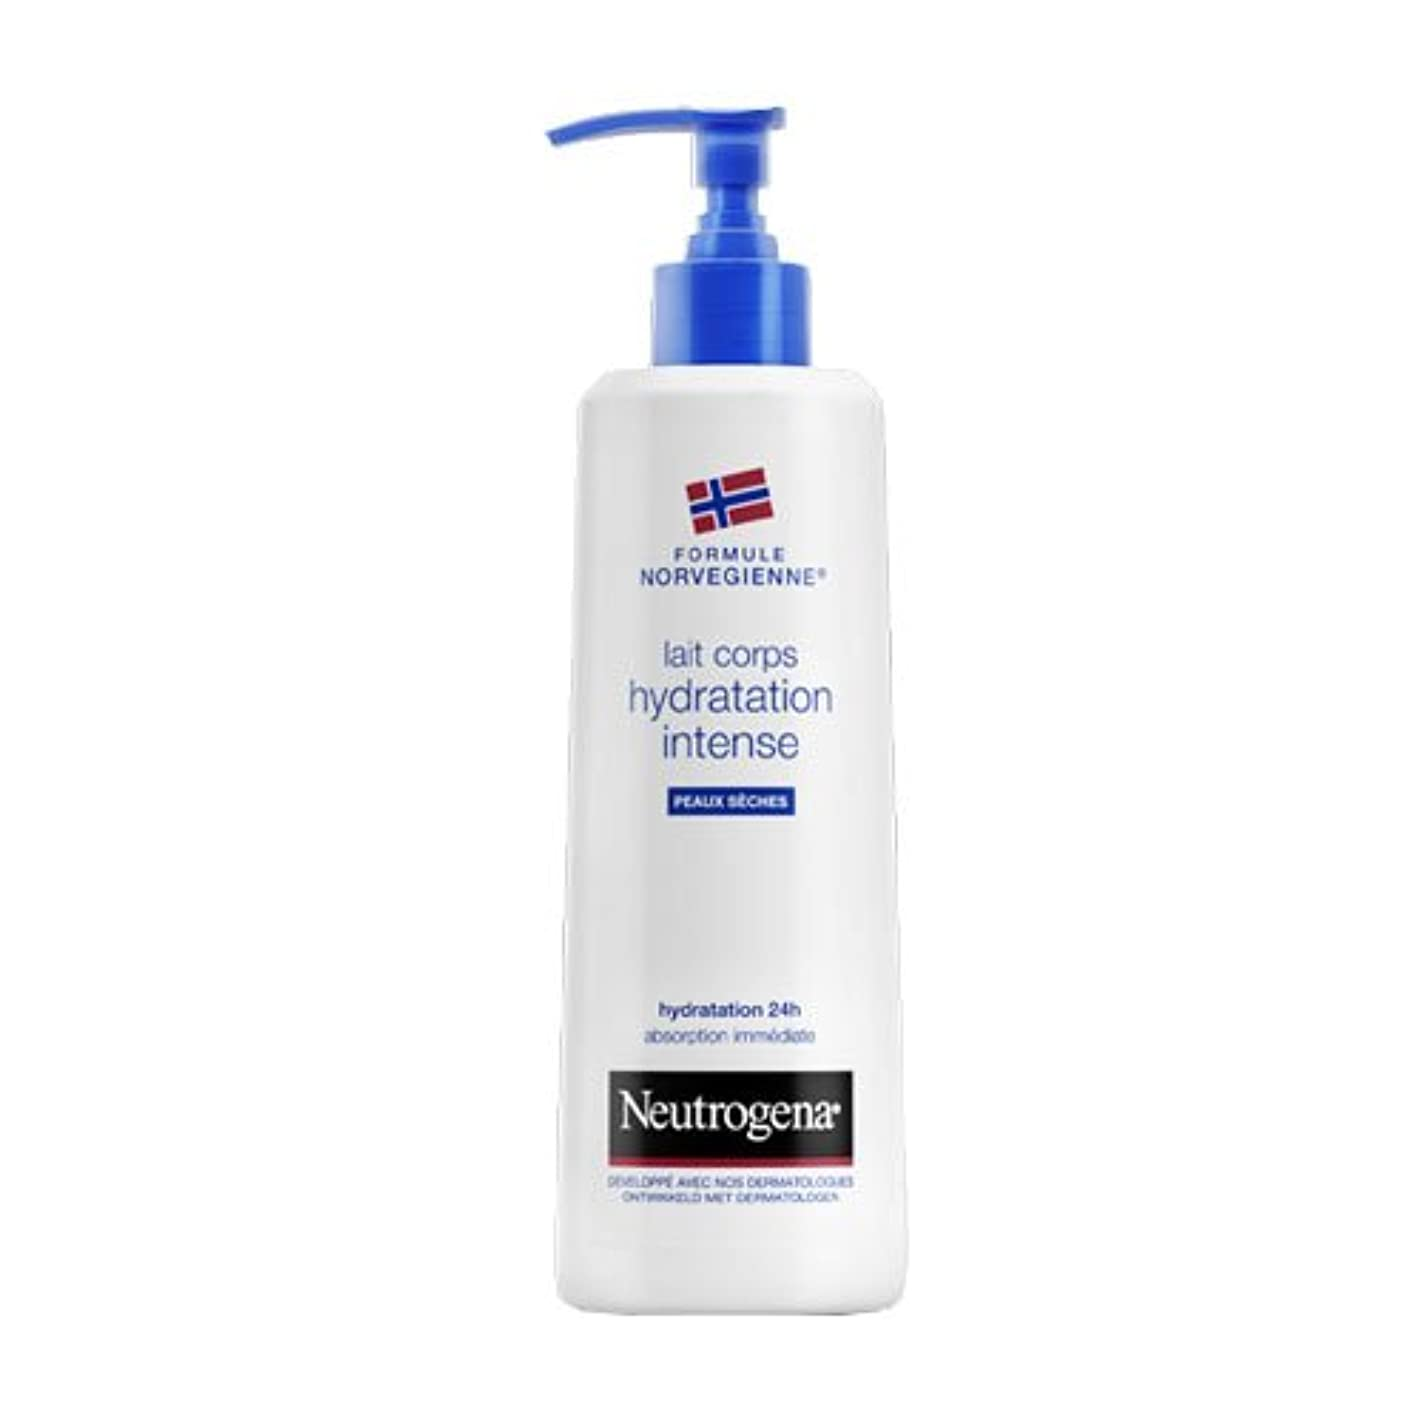 発表騒乱除去Neutrogena Body Lotion Dry Skin 750ml [並行輸入品]